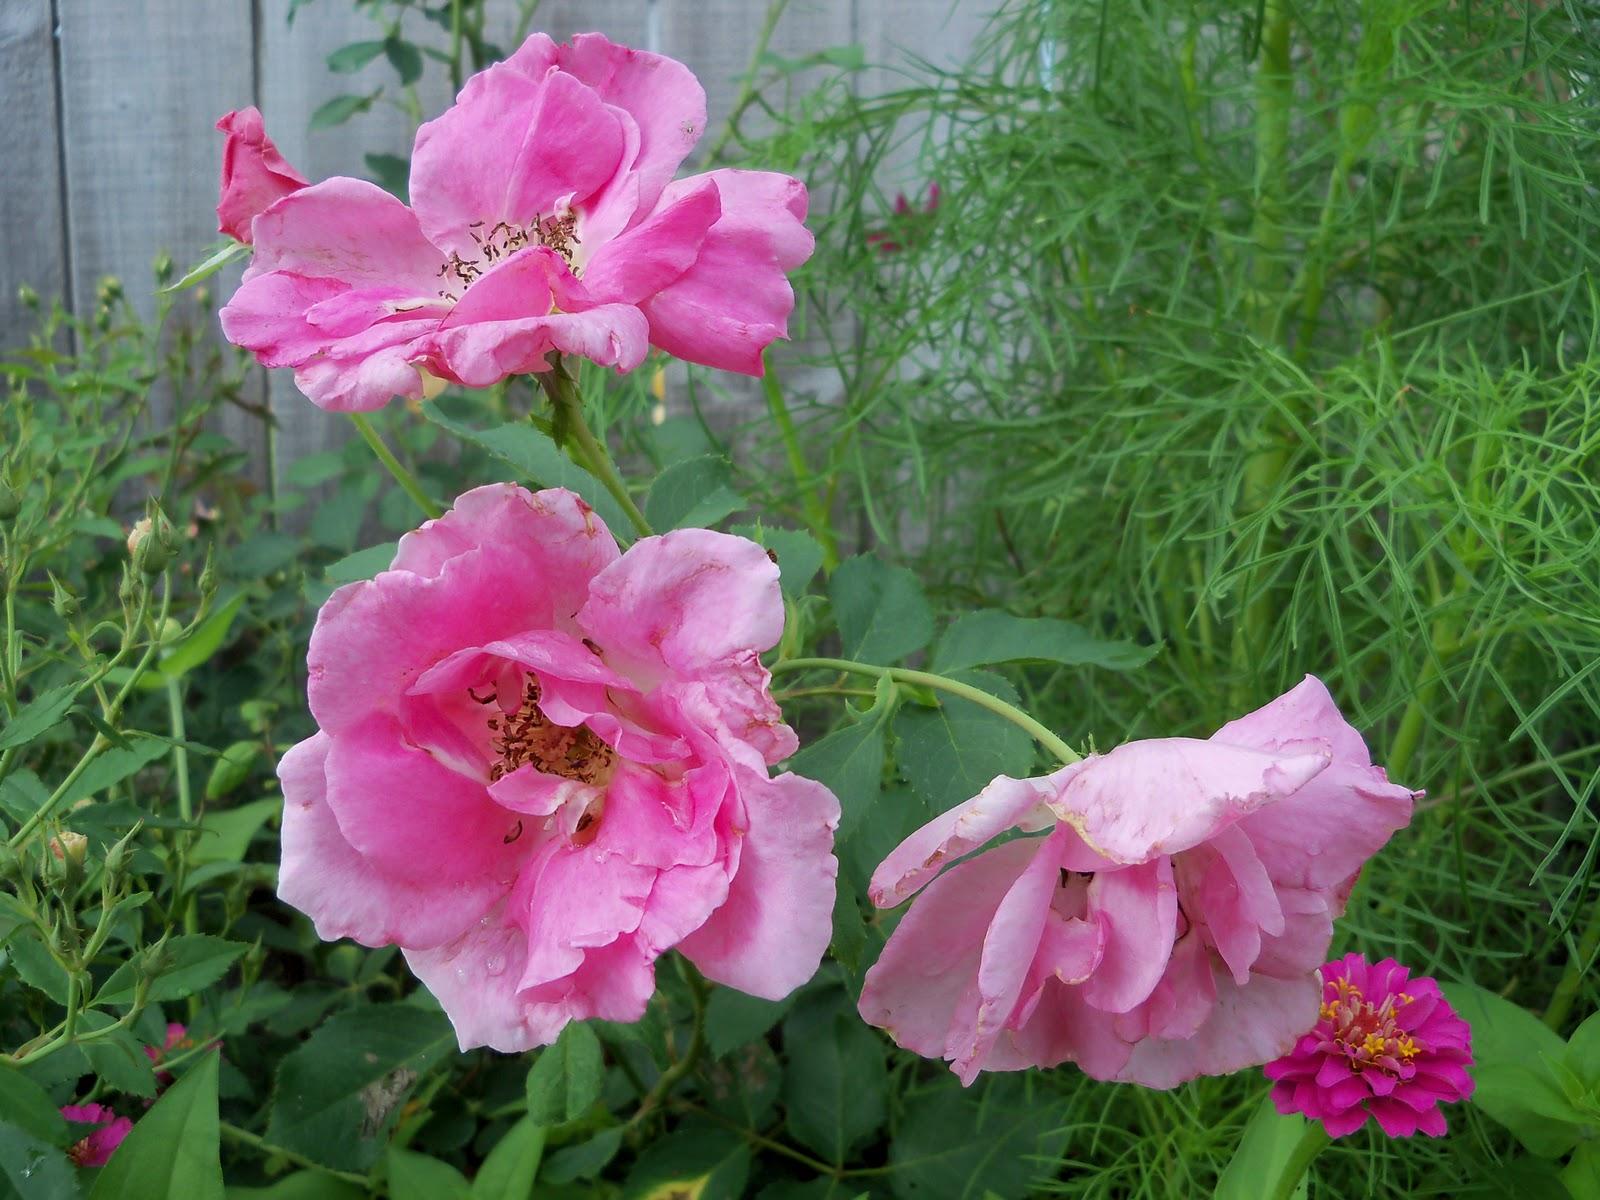 Gardening 2010, Part Three - 101_3553.JPG